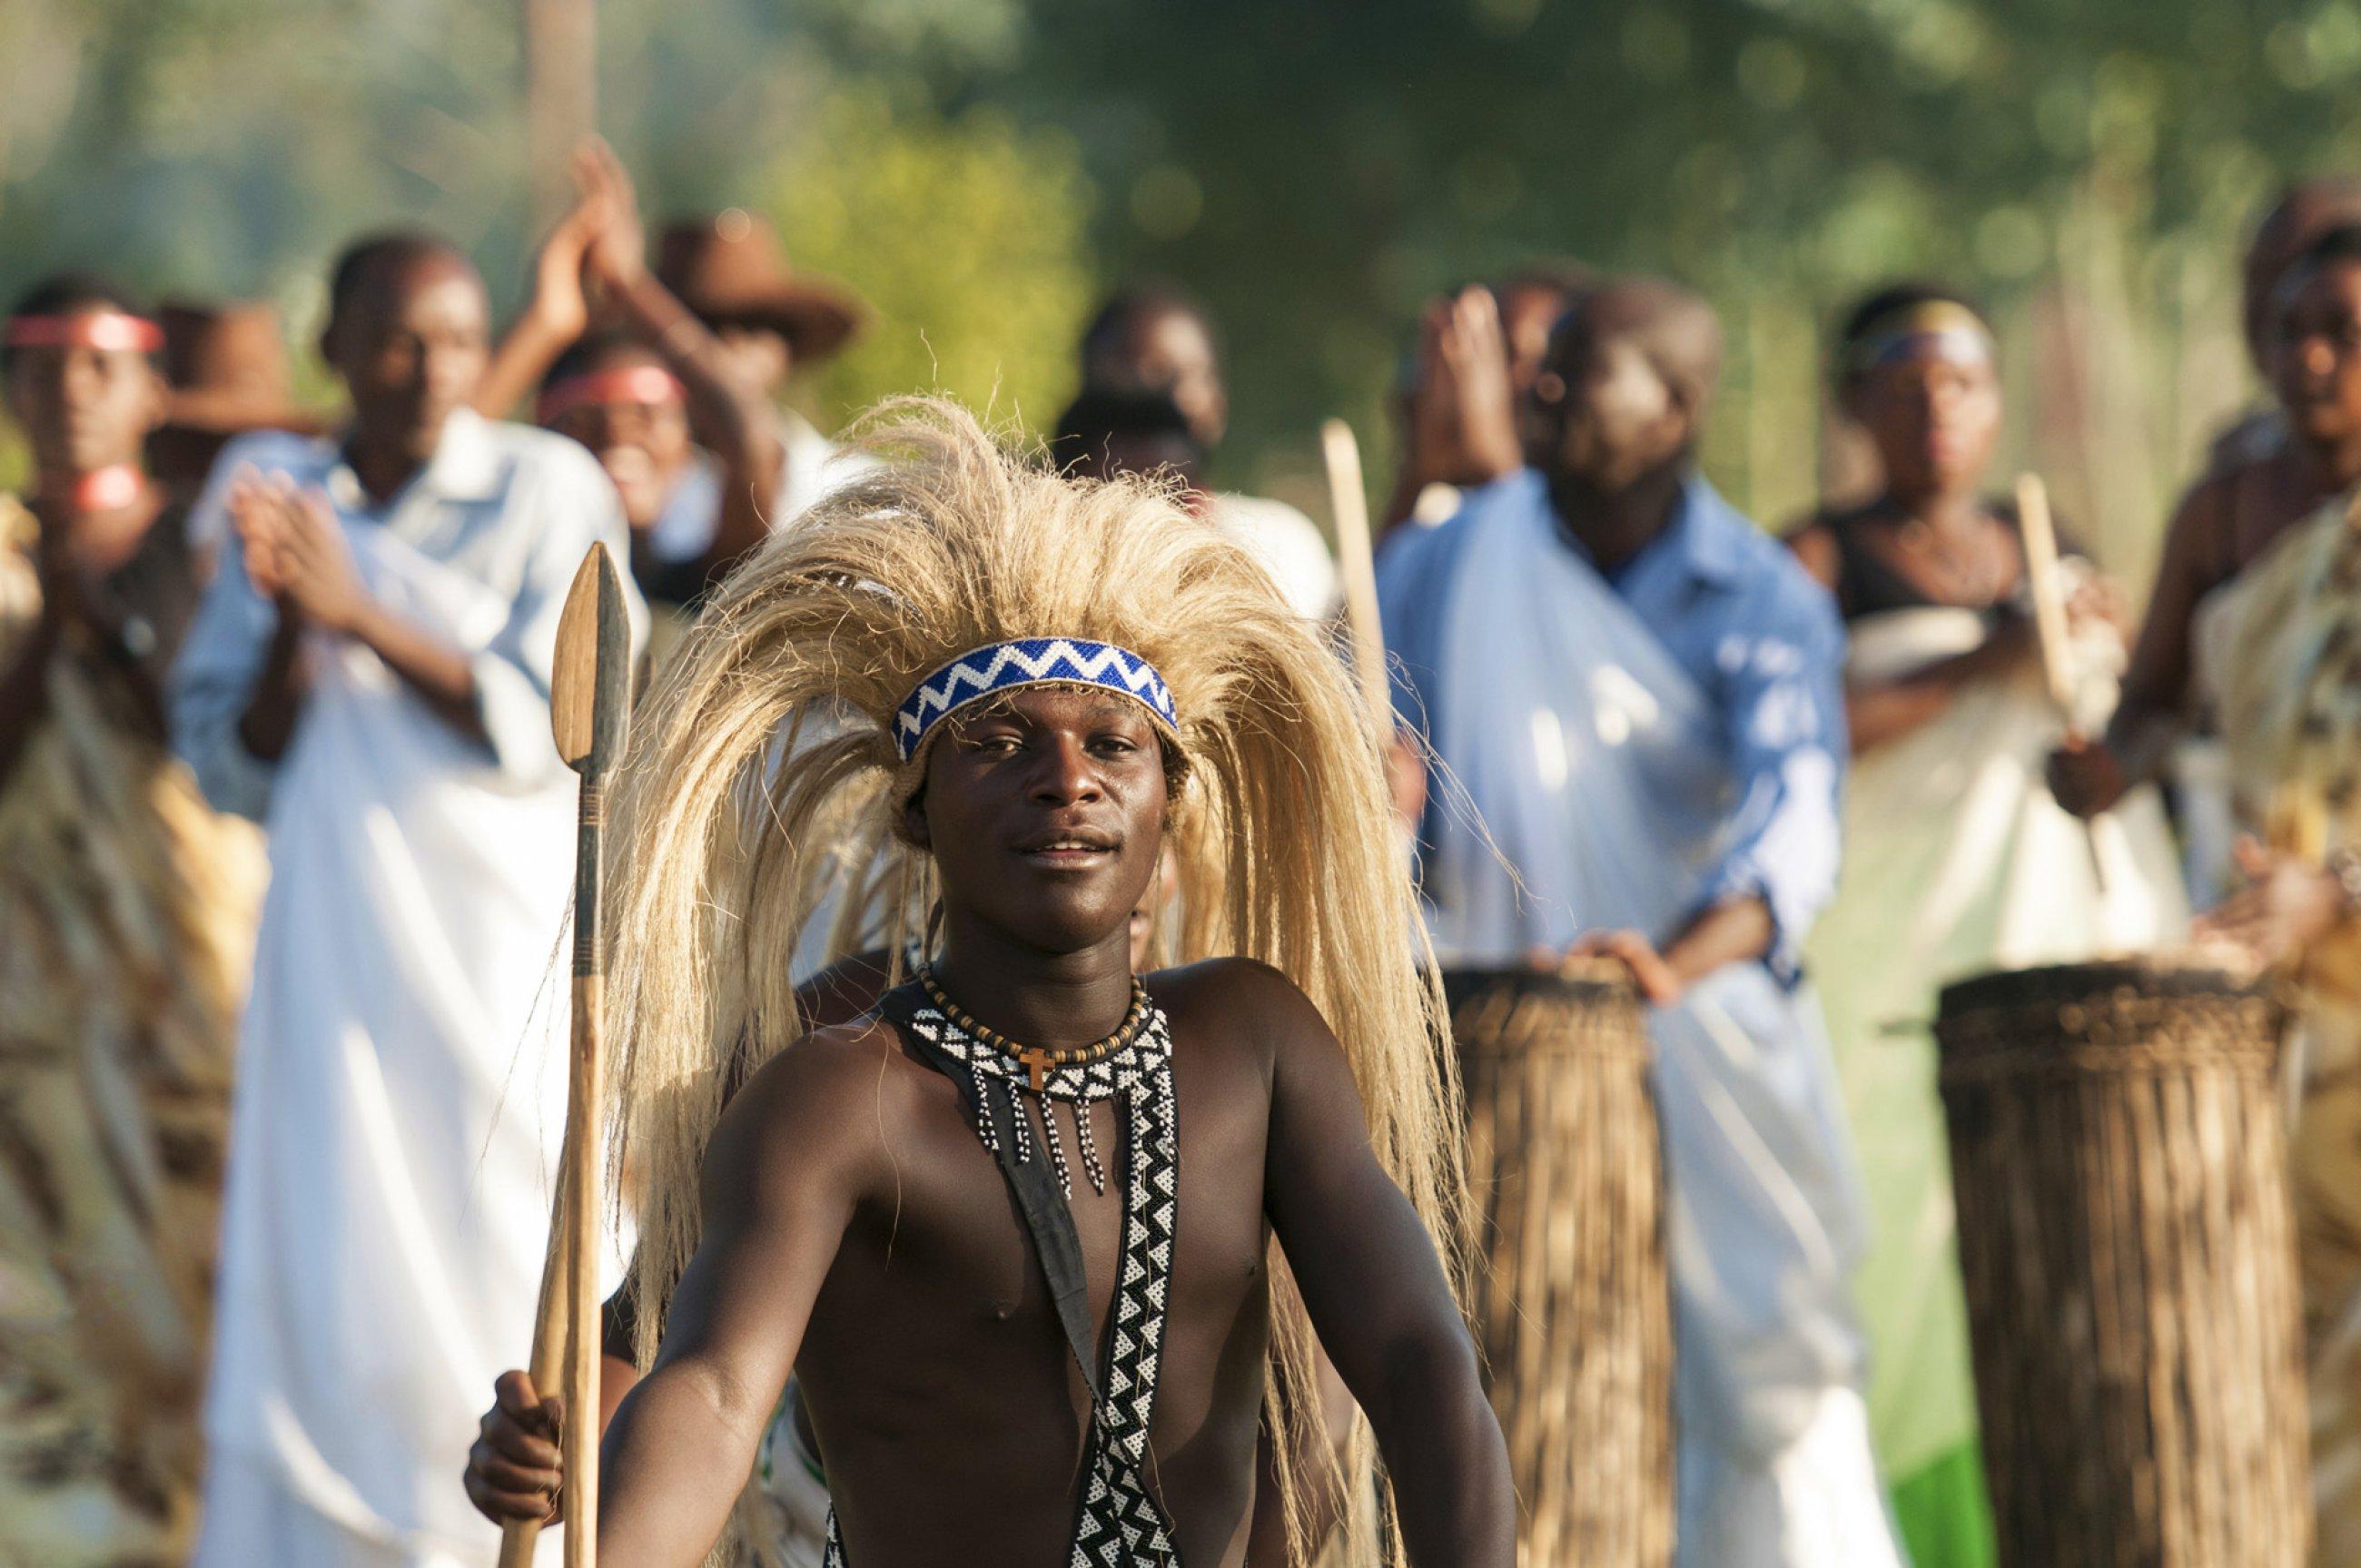 https://bubo.sk/uploads/galleries/4986/rwanda-intore-dancer-dreamstime-xl-42888768.jpg